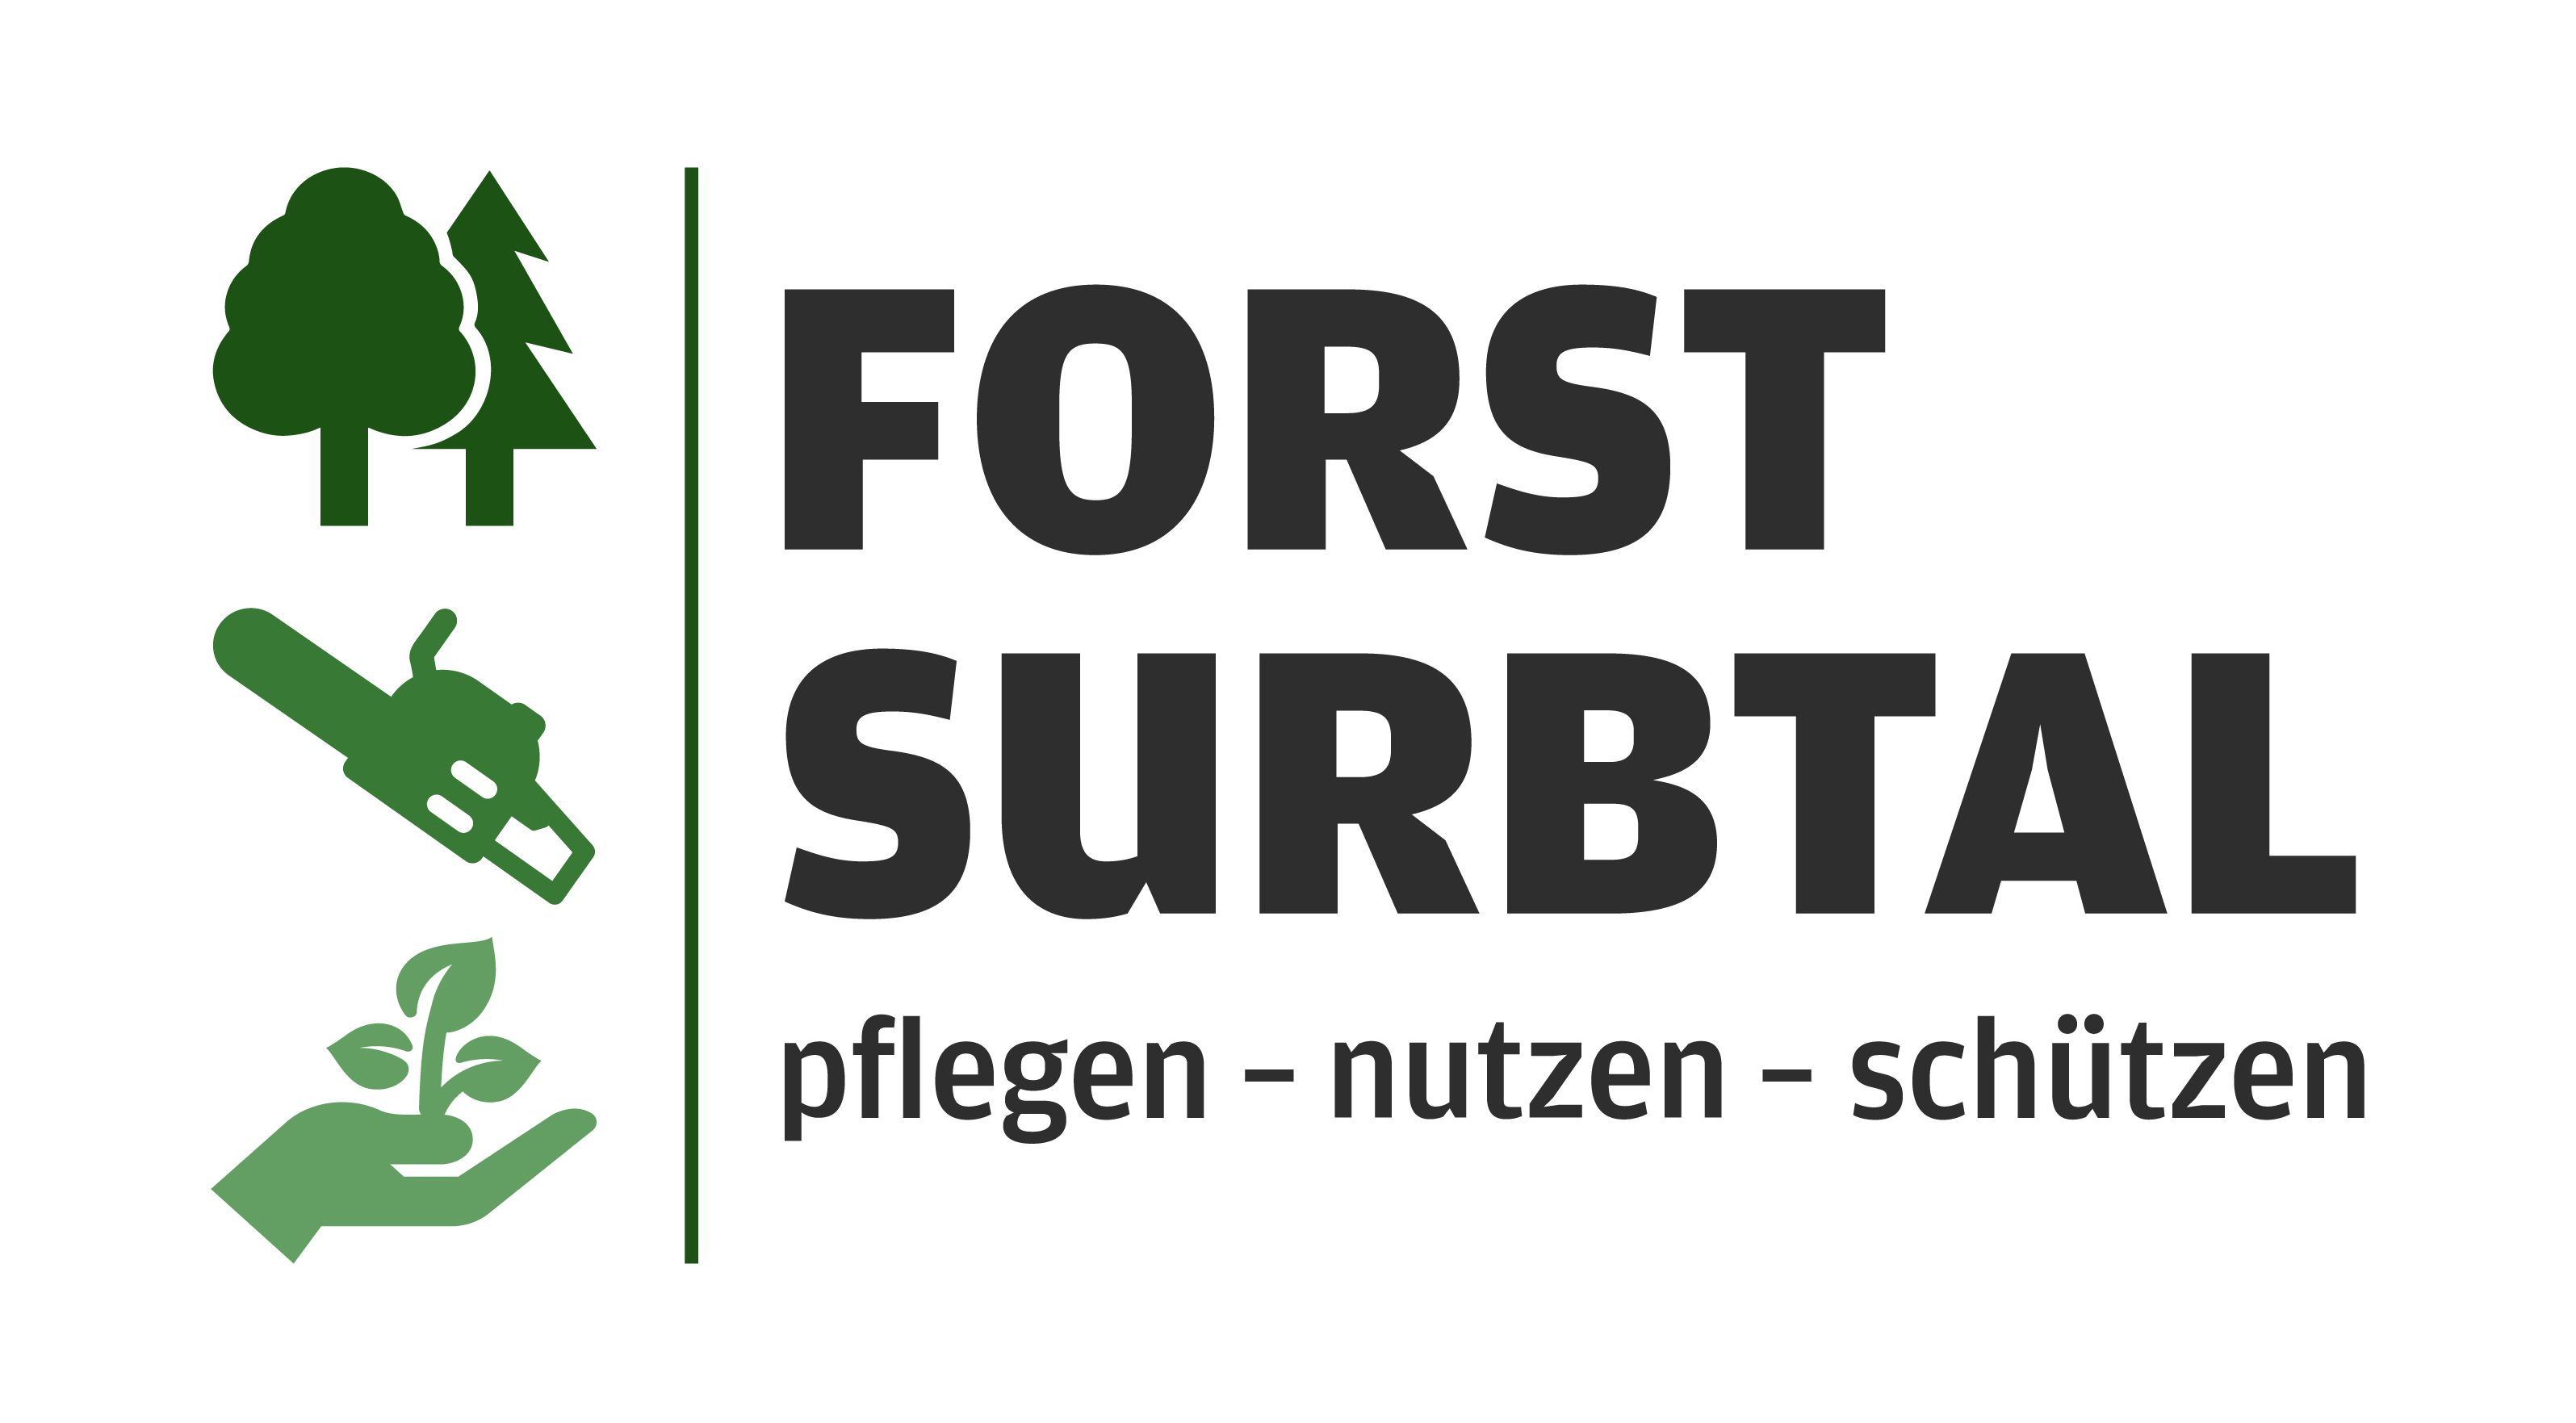 Forstbetrieb Surbtal